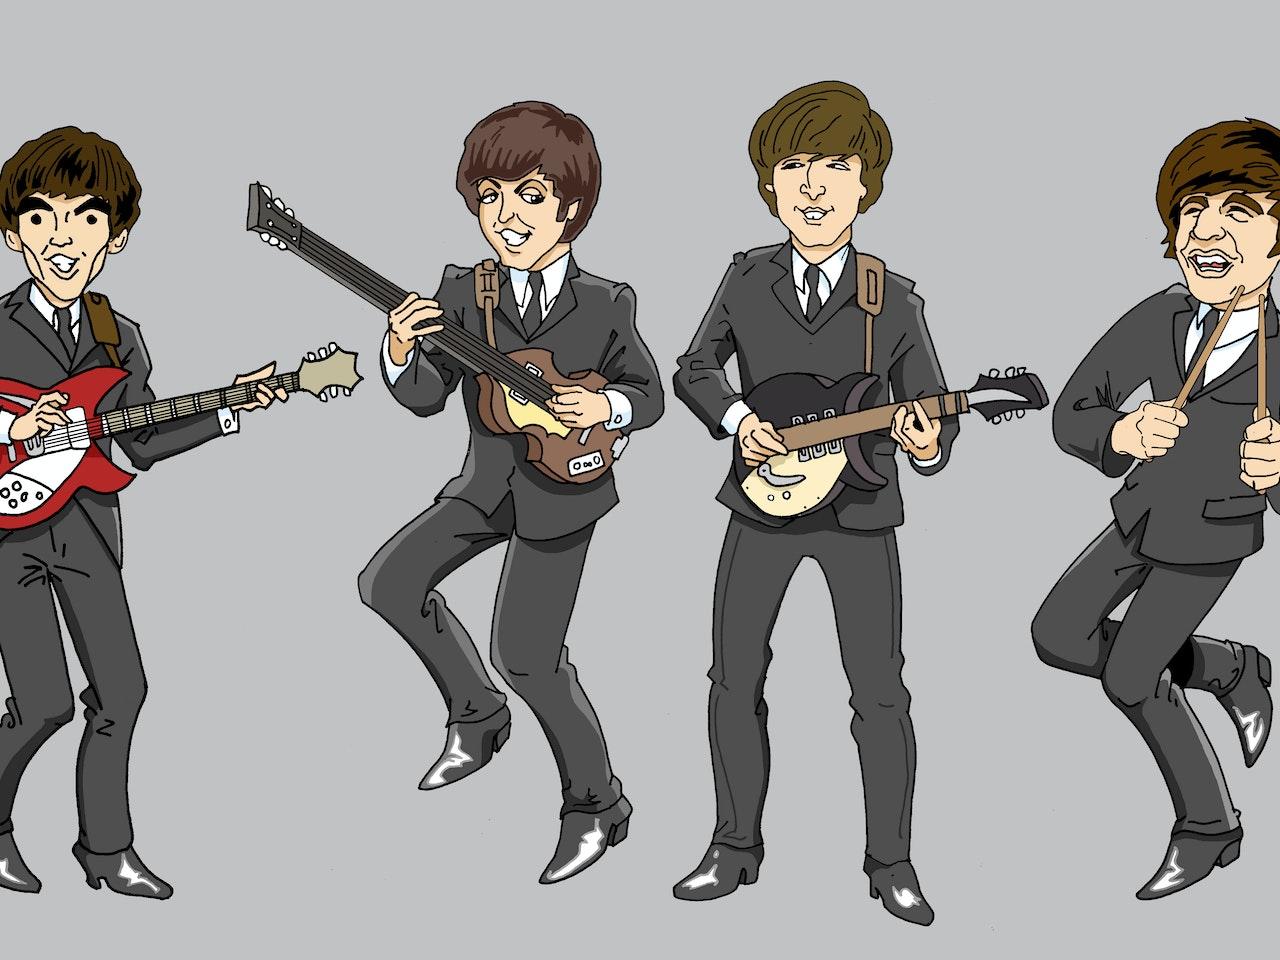 funny happy humorous comical colourful graphic cartoon anime FAB 4  beatles liverpool john paul george ringo moptop music merseybeat retro 1960 swinging '60s